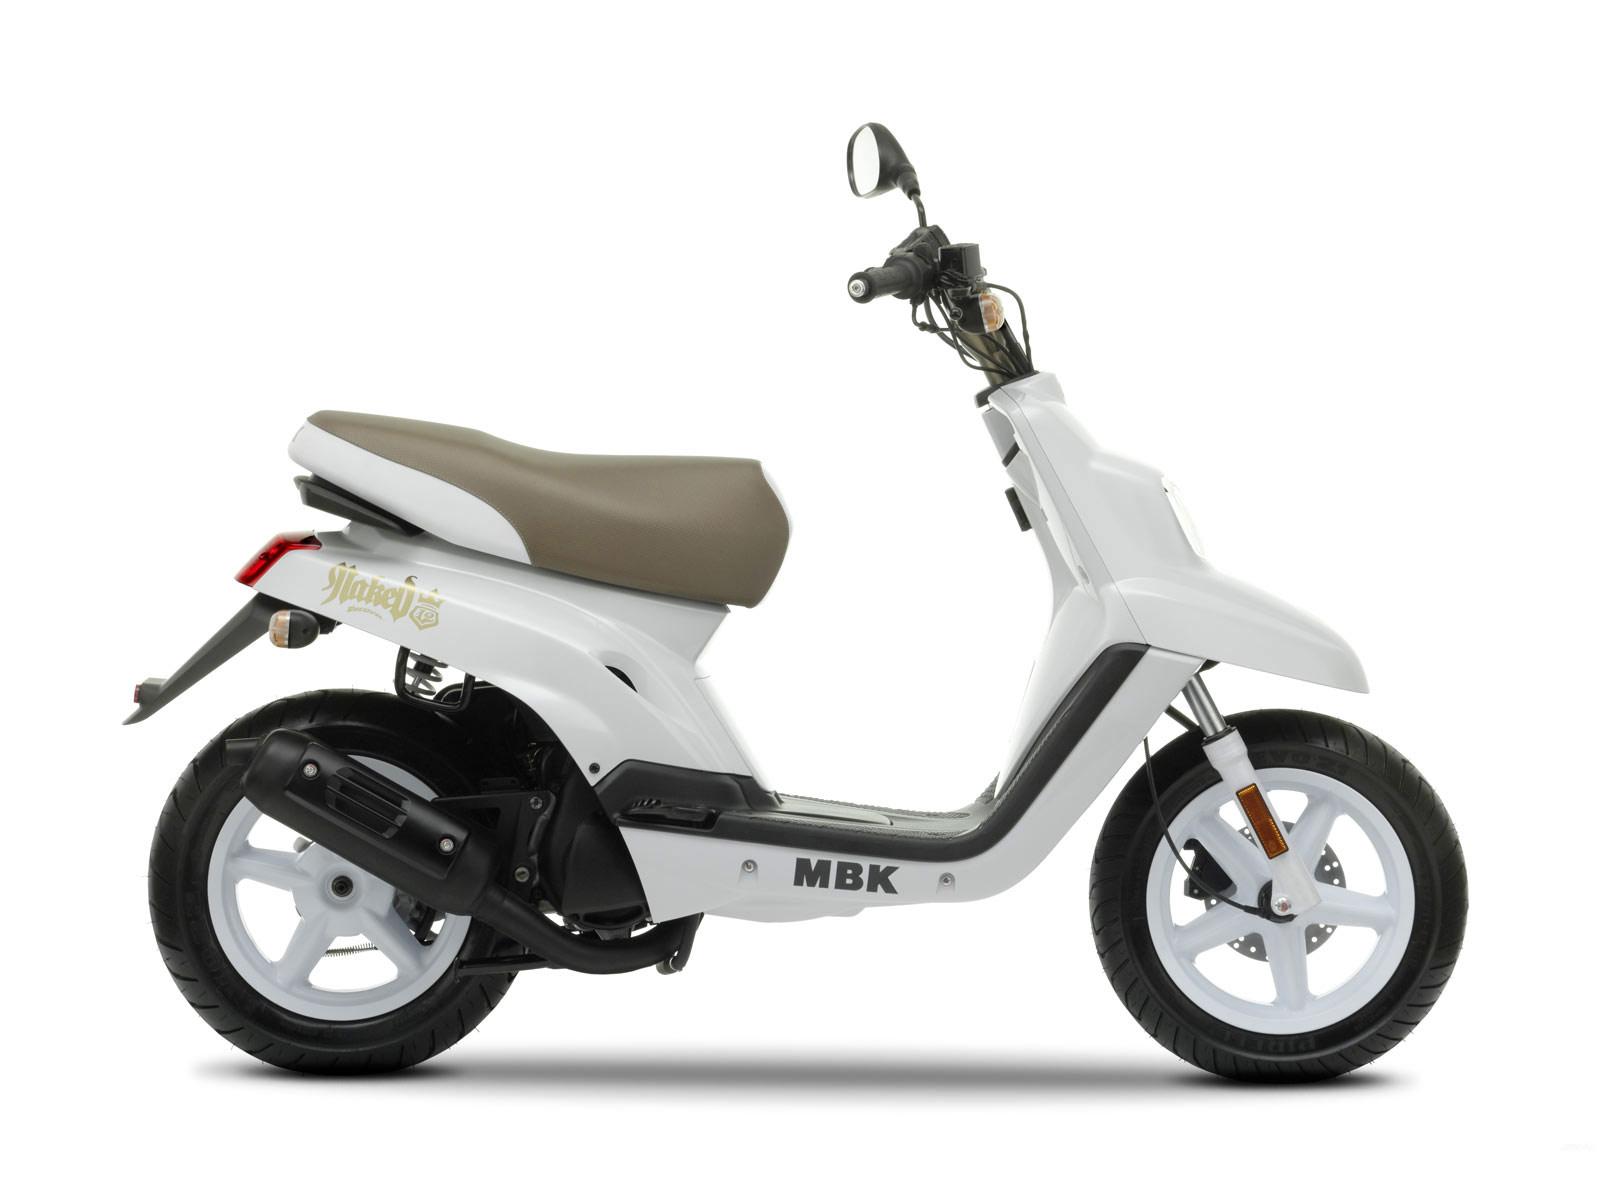 2006 MBK Booster Naked - Moto.ZombDrive.COM